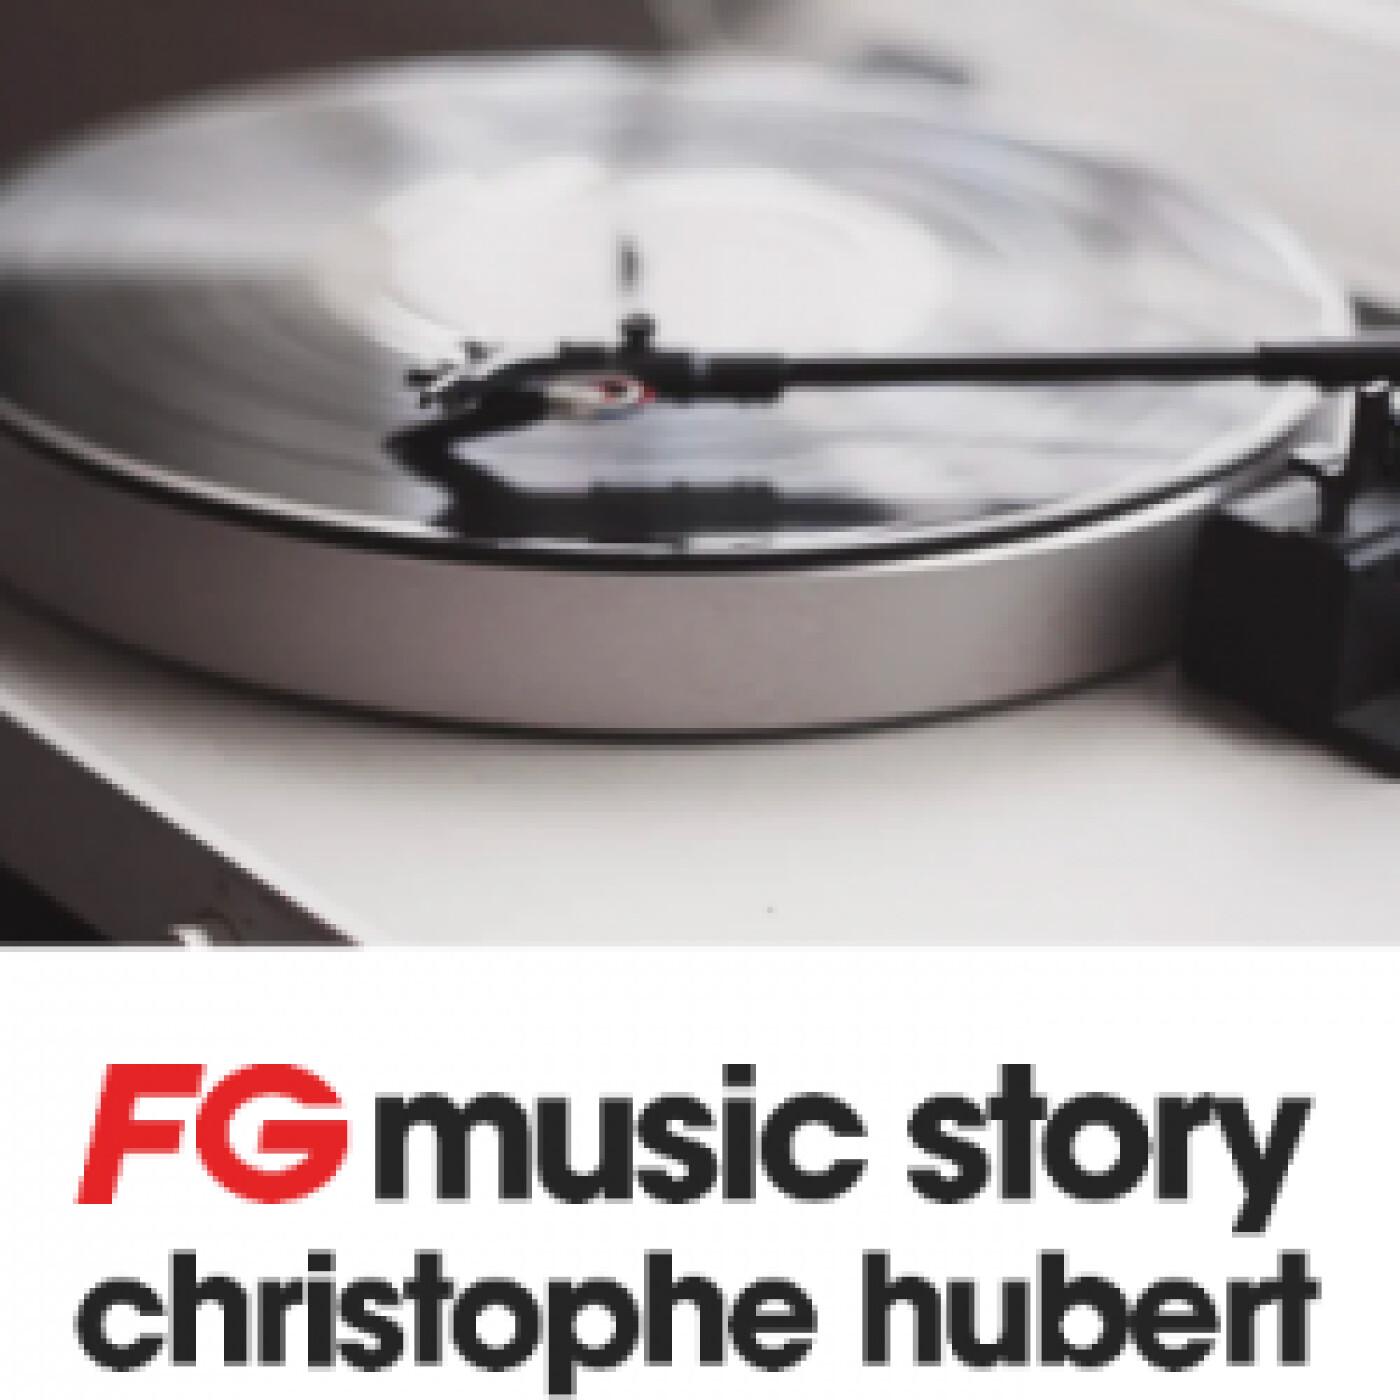 FG MUSIC STORY : QUBIKO